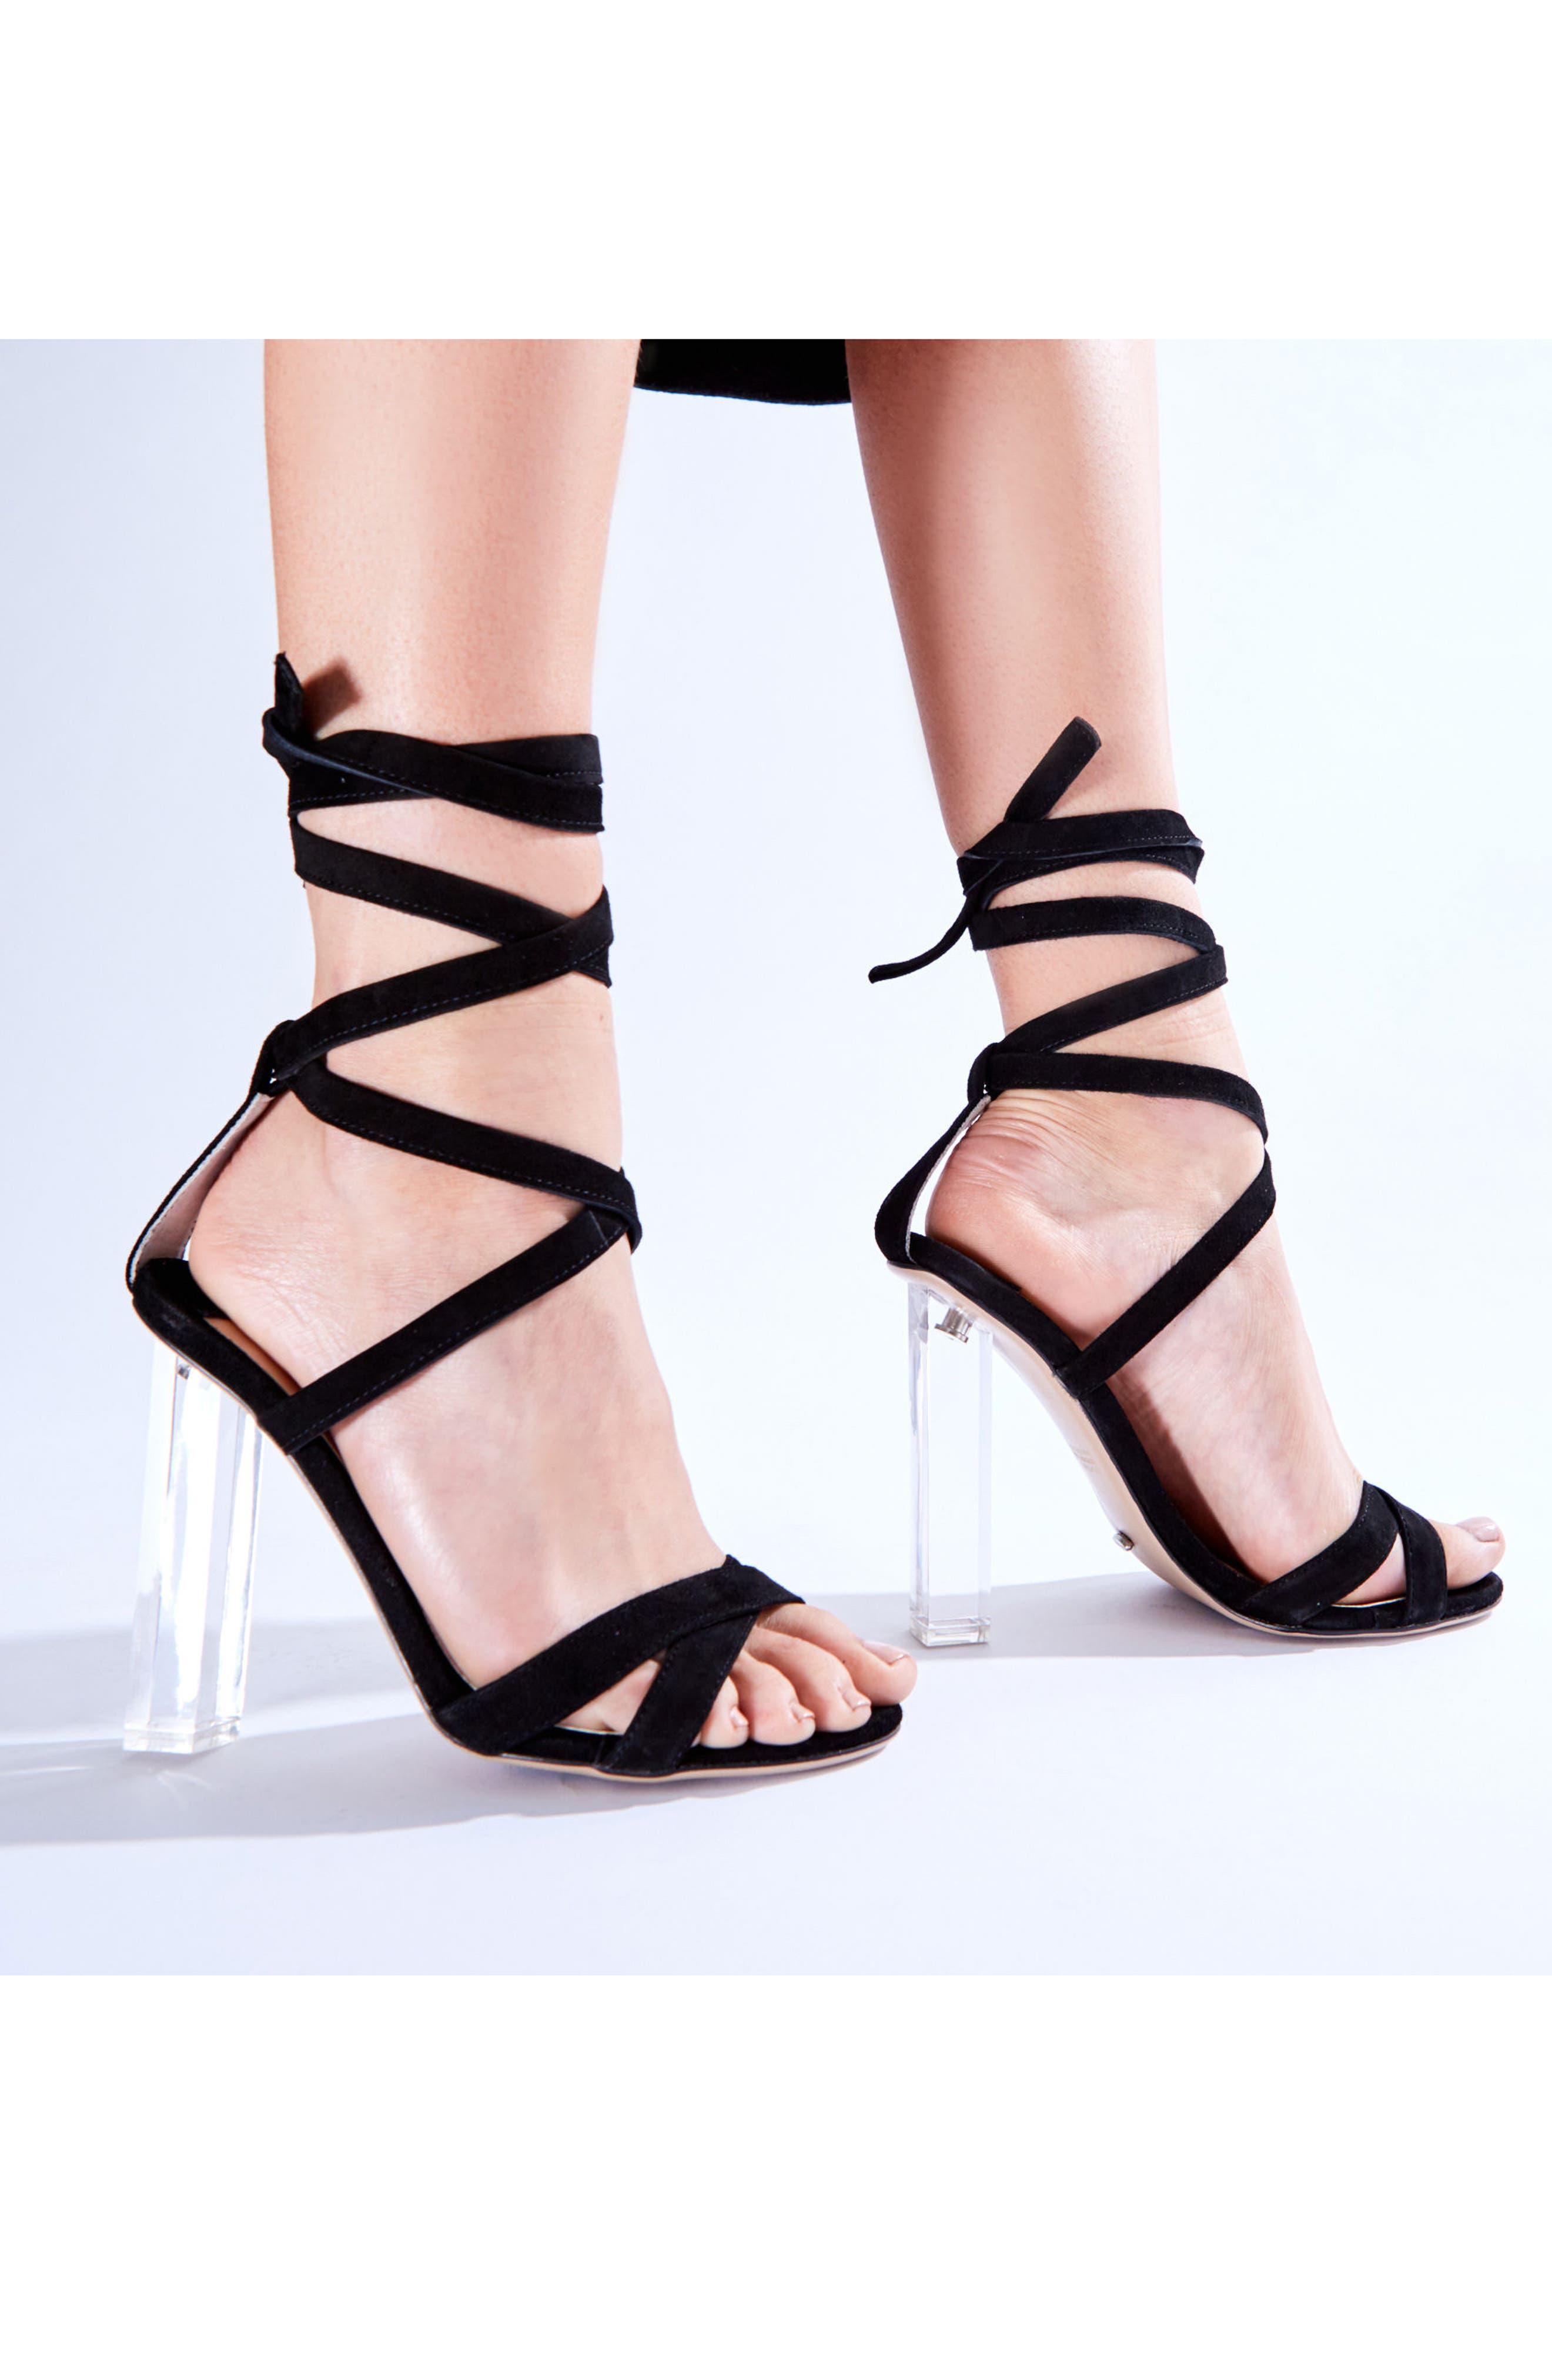 Komma Translucent Heel Sandal,                             Alternate thumbnail 5, color,                             001